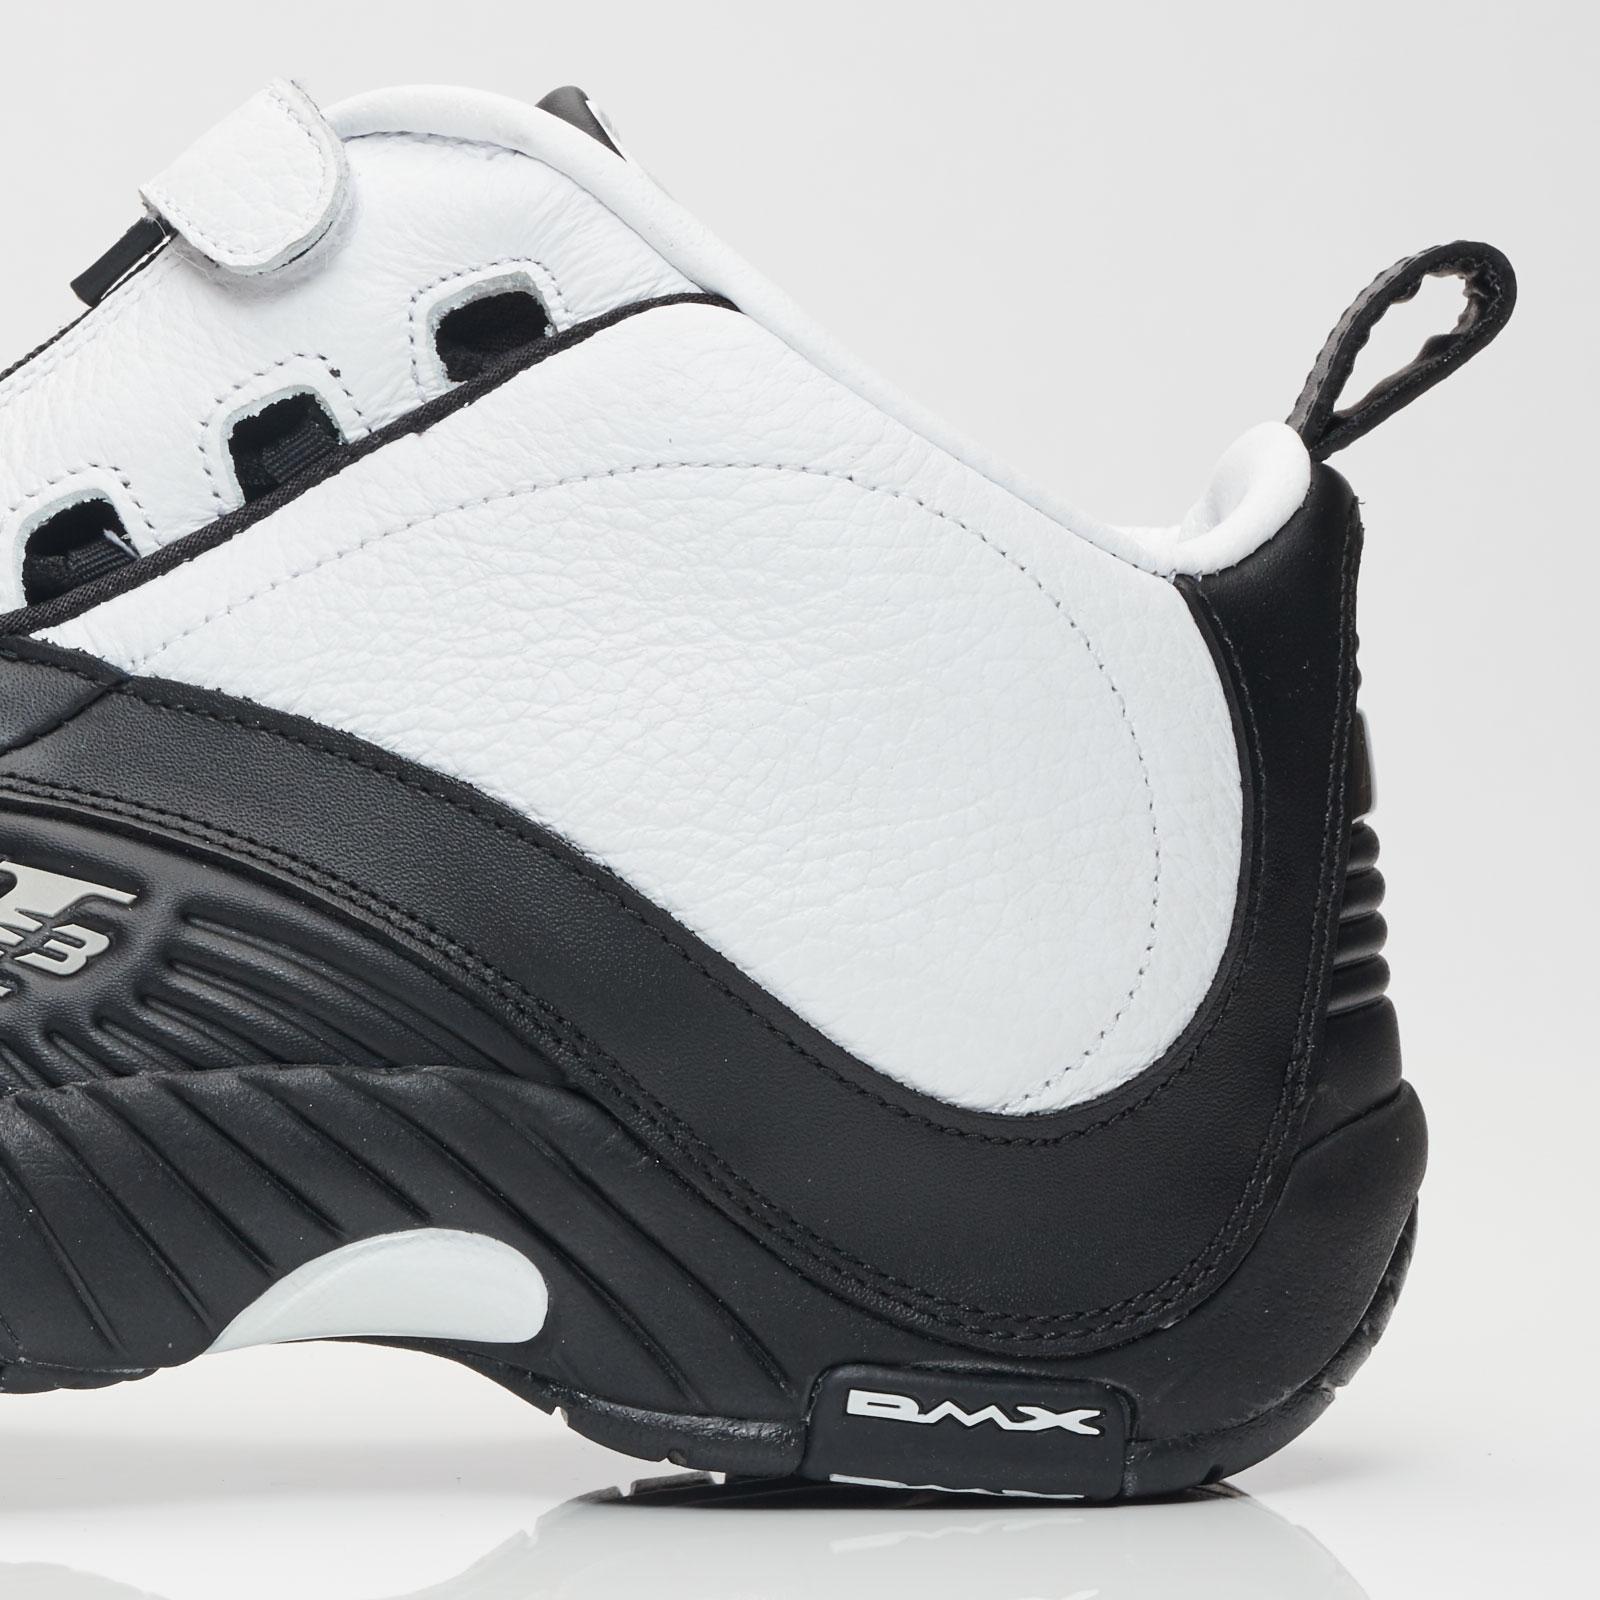 9d1710d94149e9 Reebok Answer IV Stepover - V55619 - Sneakersnstuff